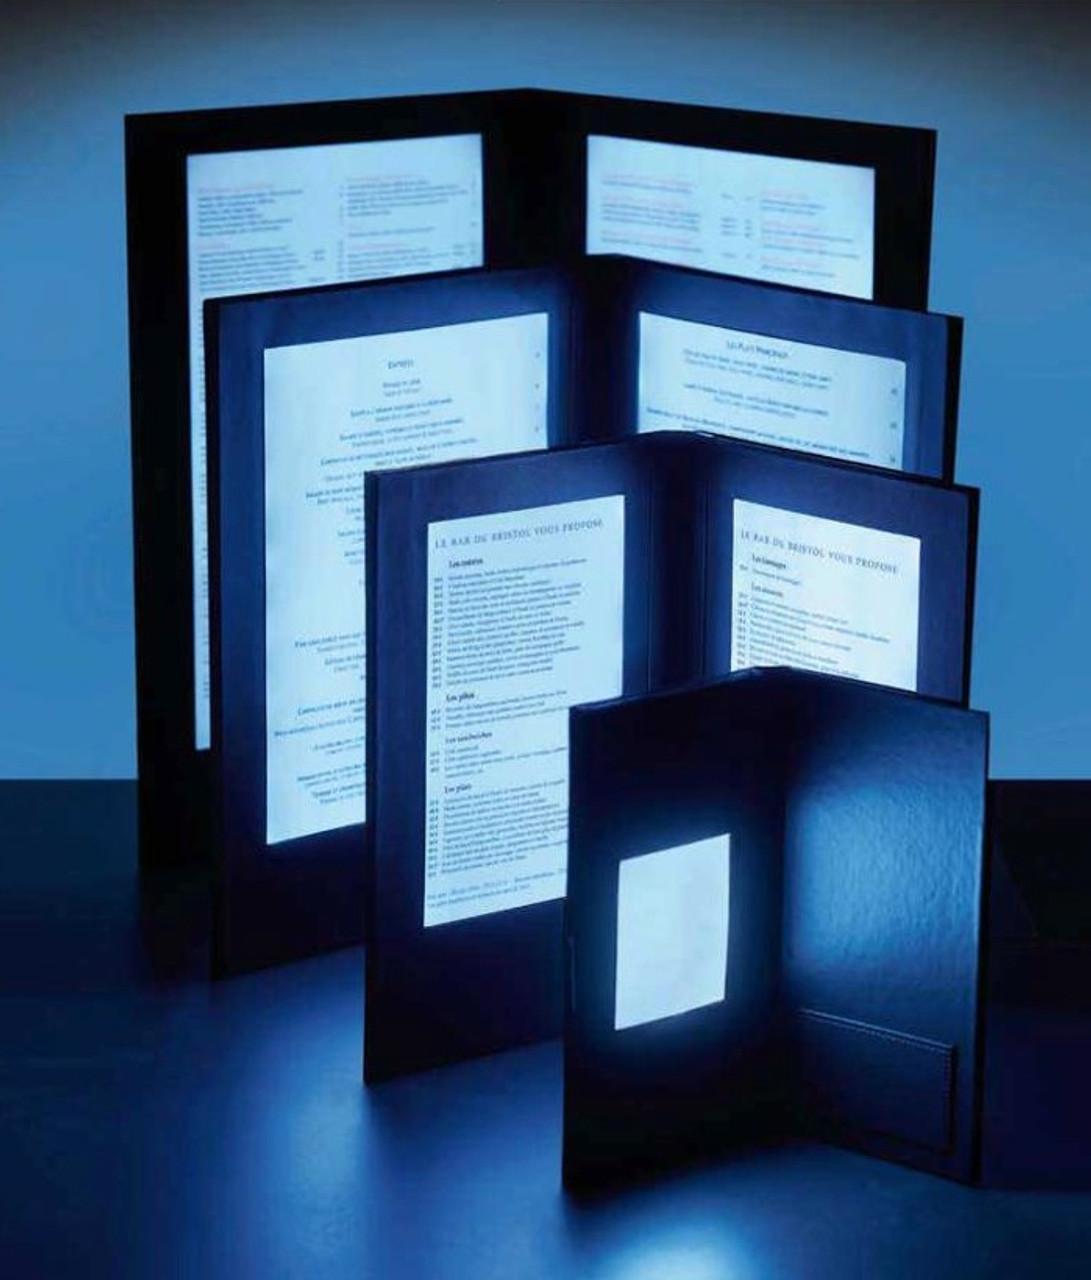 LED, Light up, illuminated, menu, check presenter, restaurant, order, wine list